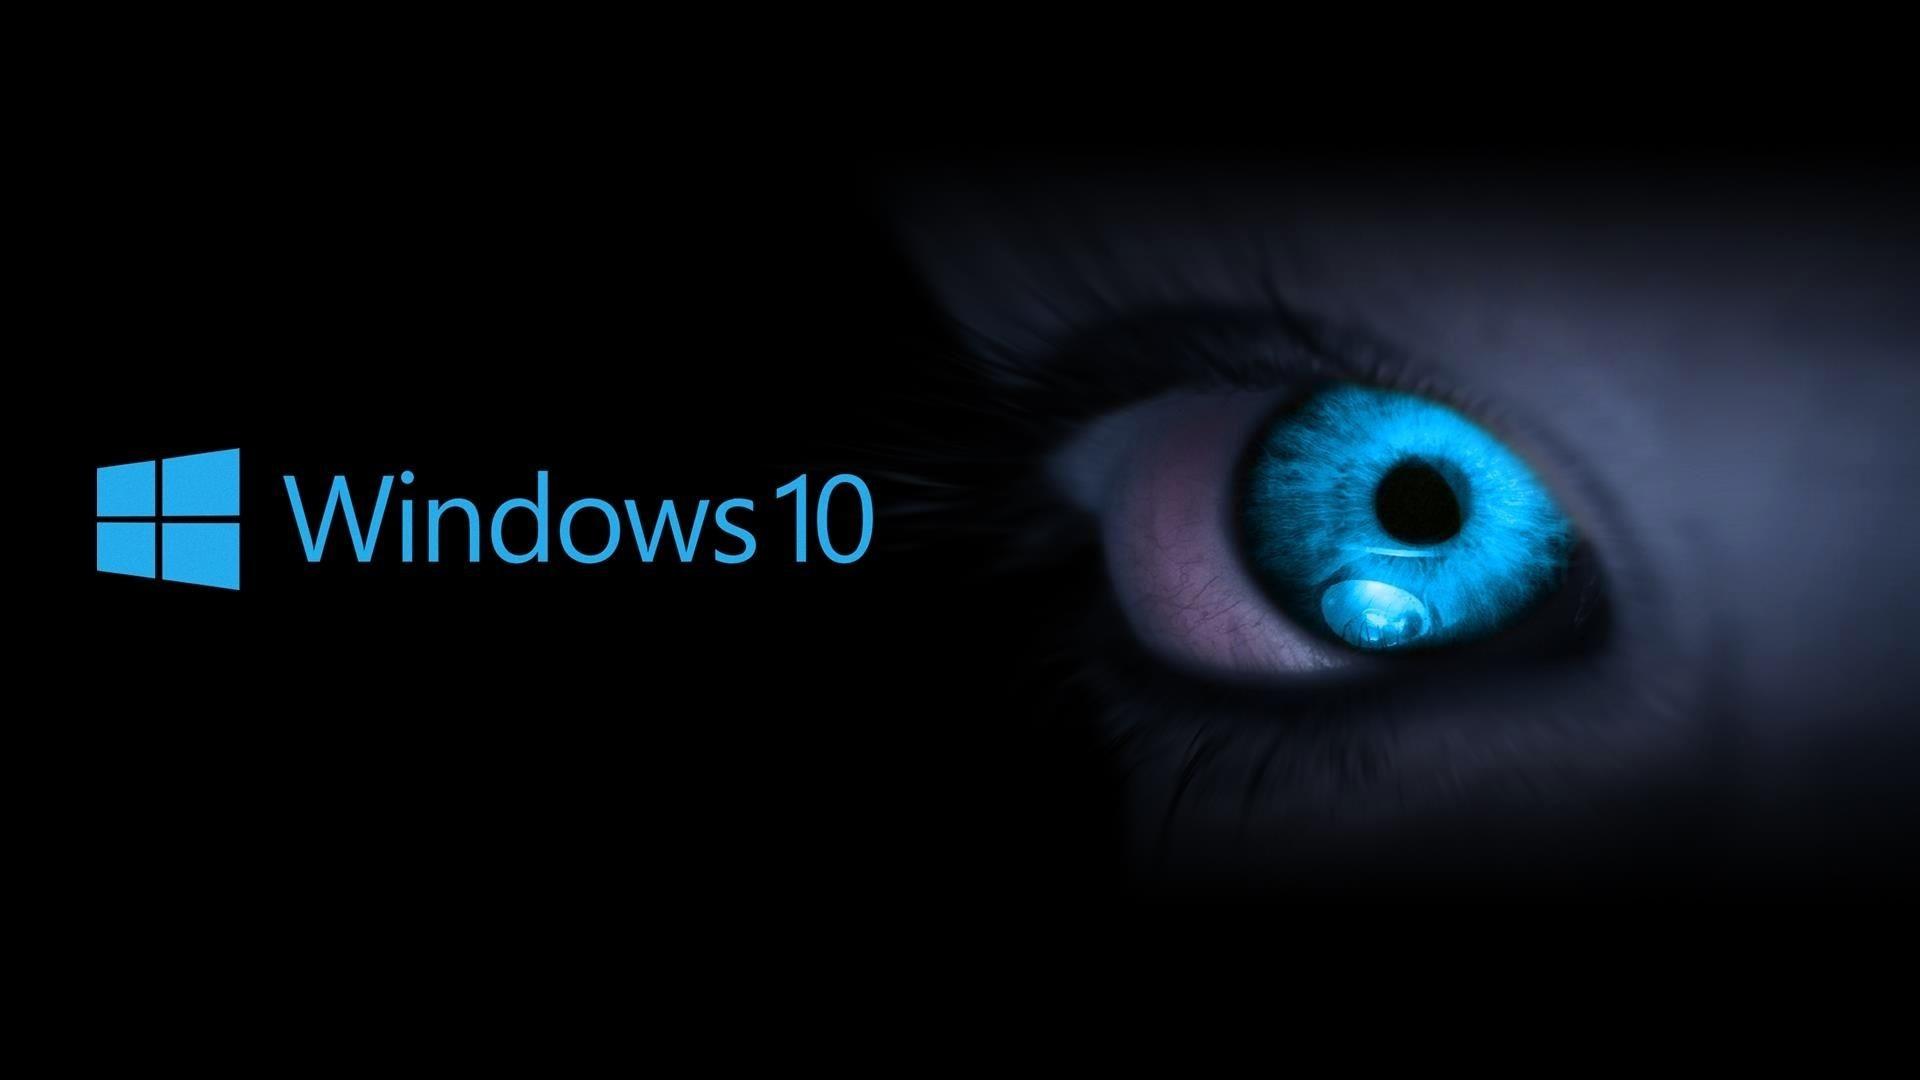 Windows 10 HD Dark Wallpaper (83+ images)